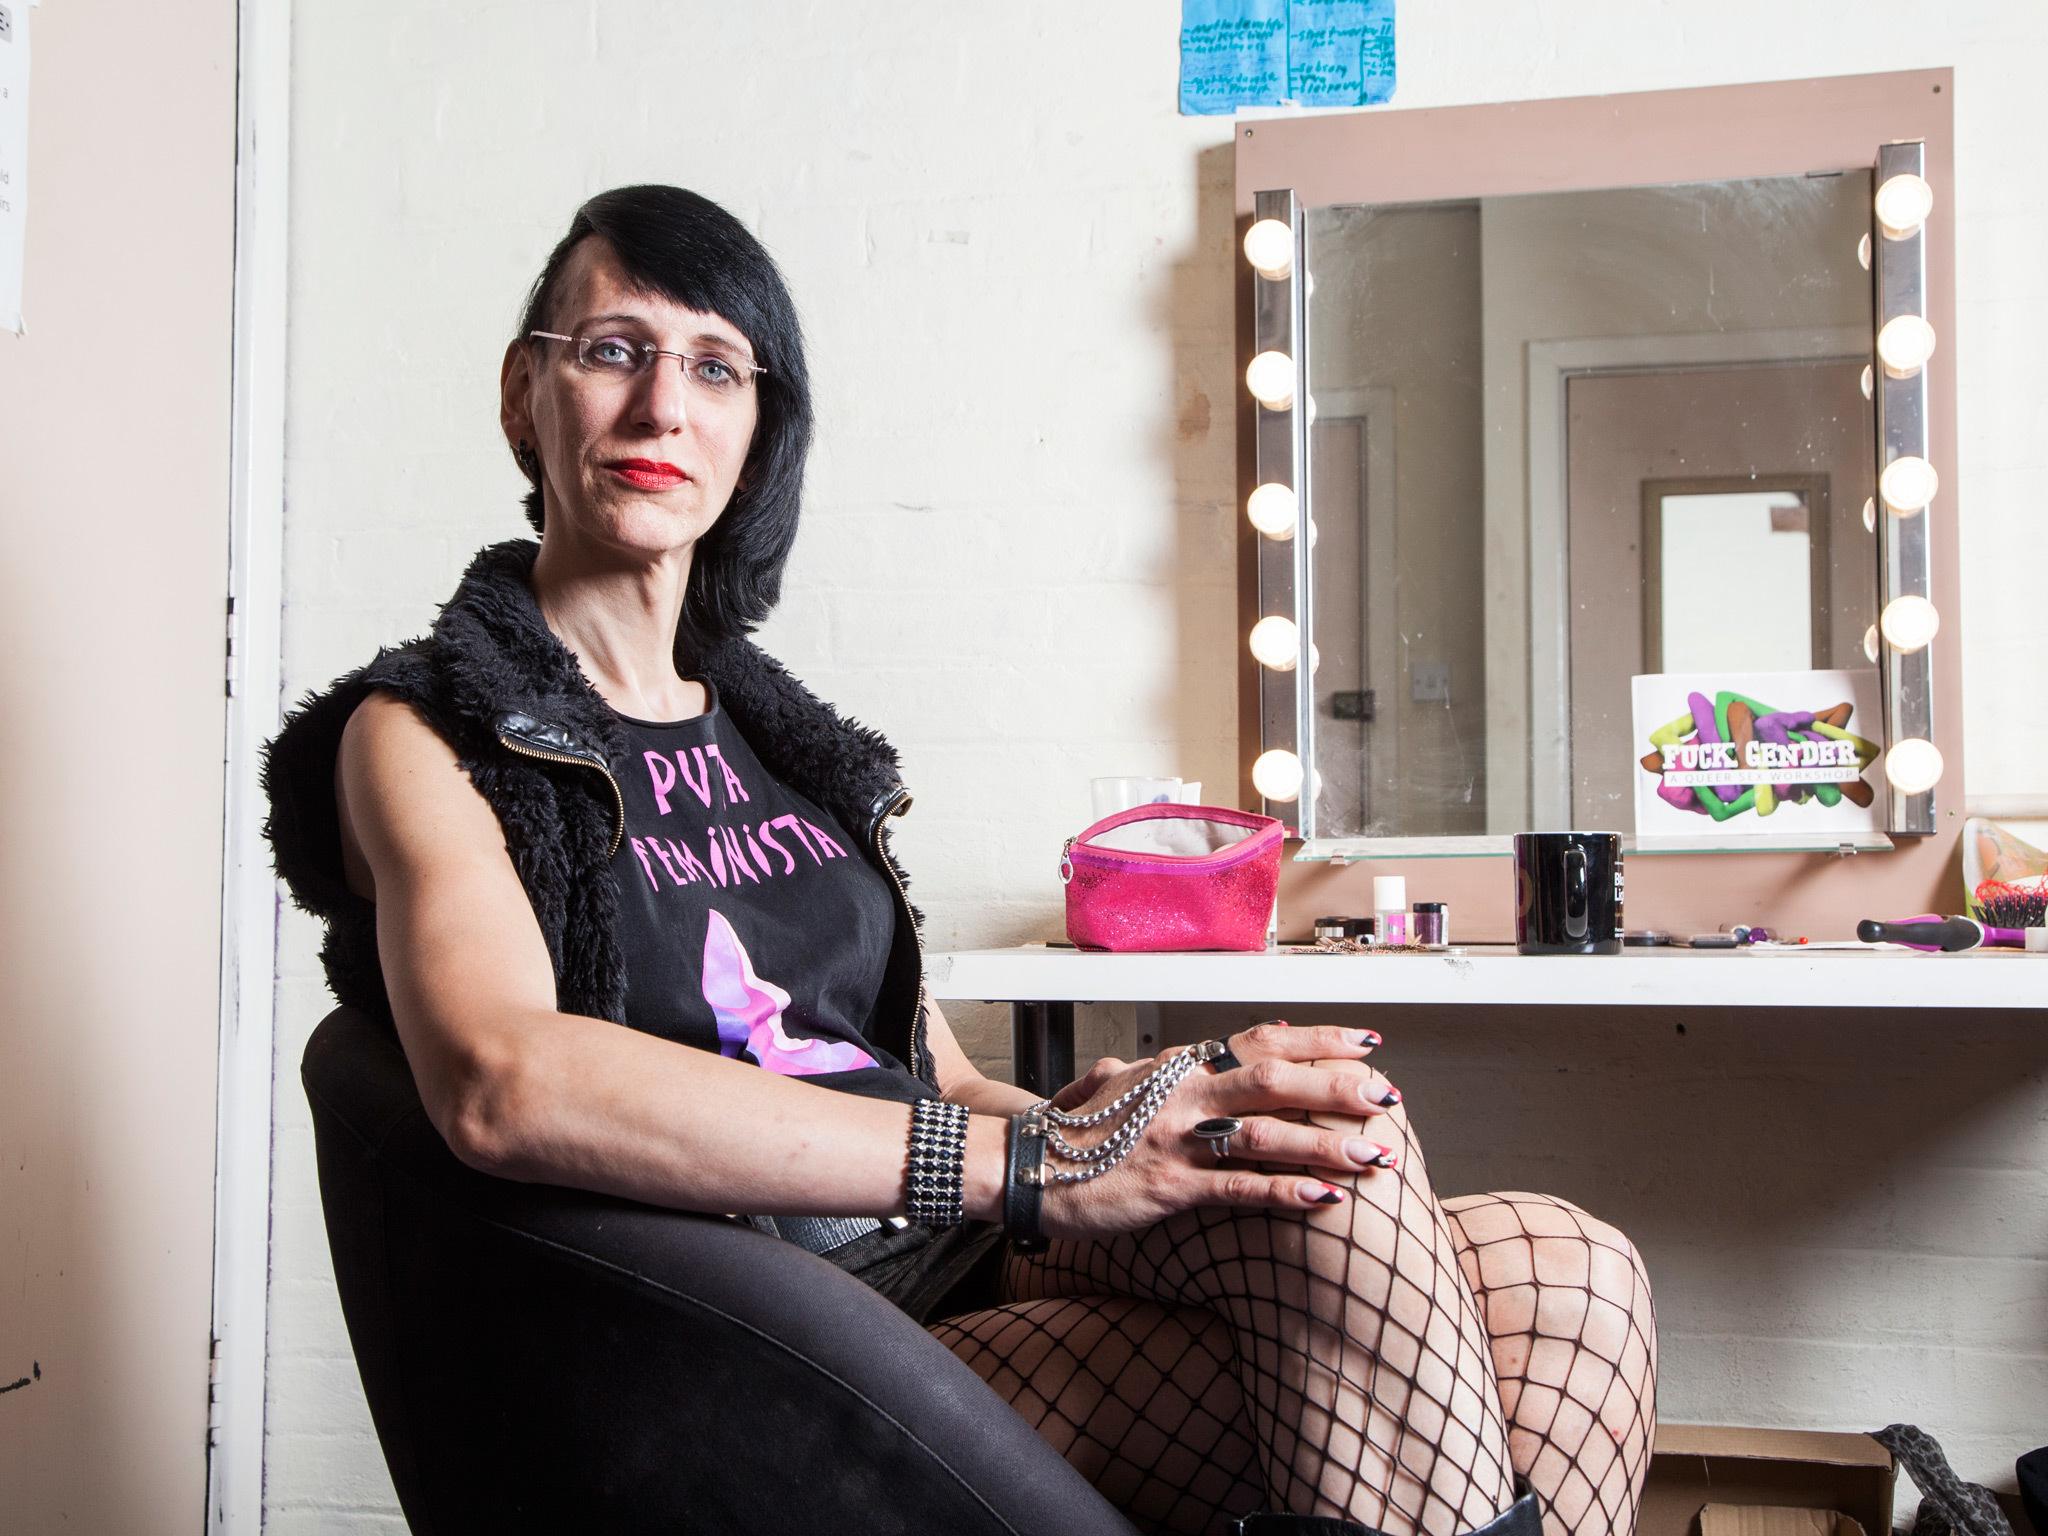 Sex Workers' Opera: Emy Fem